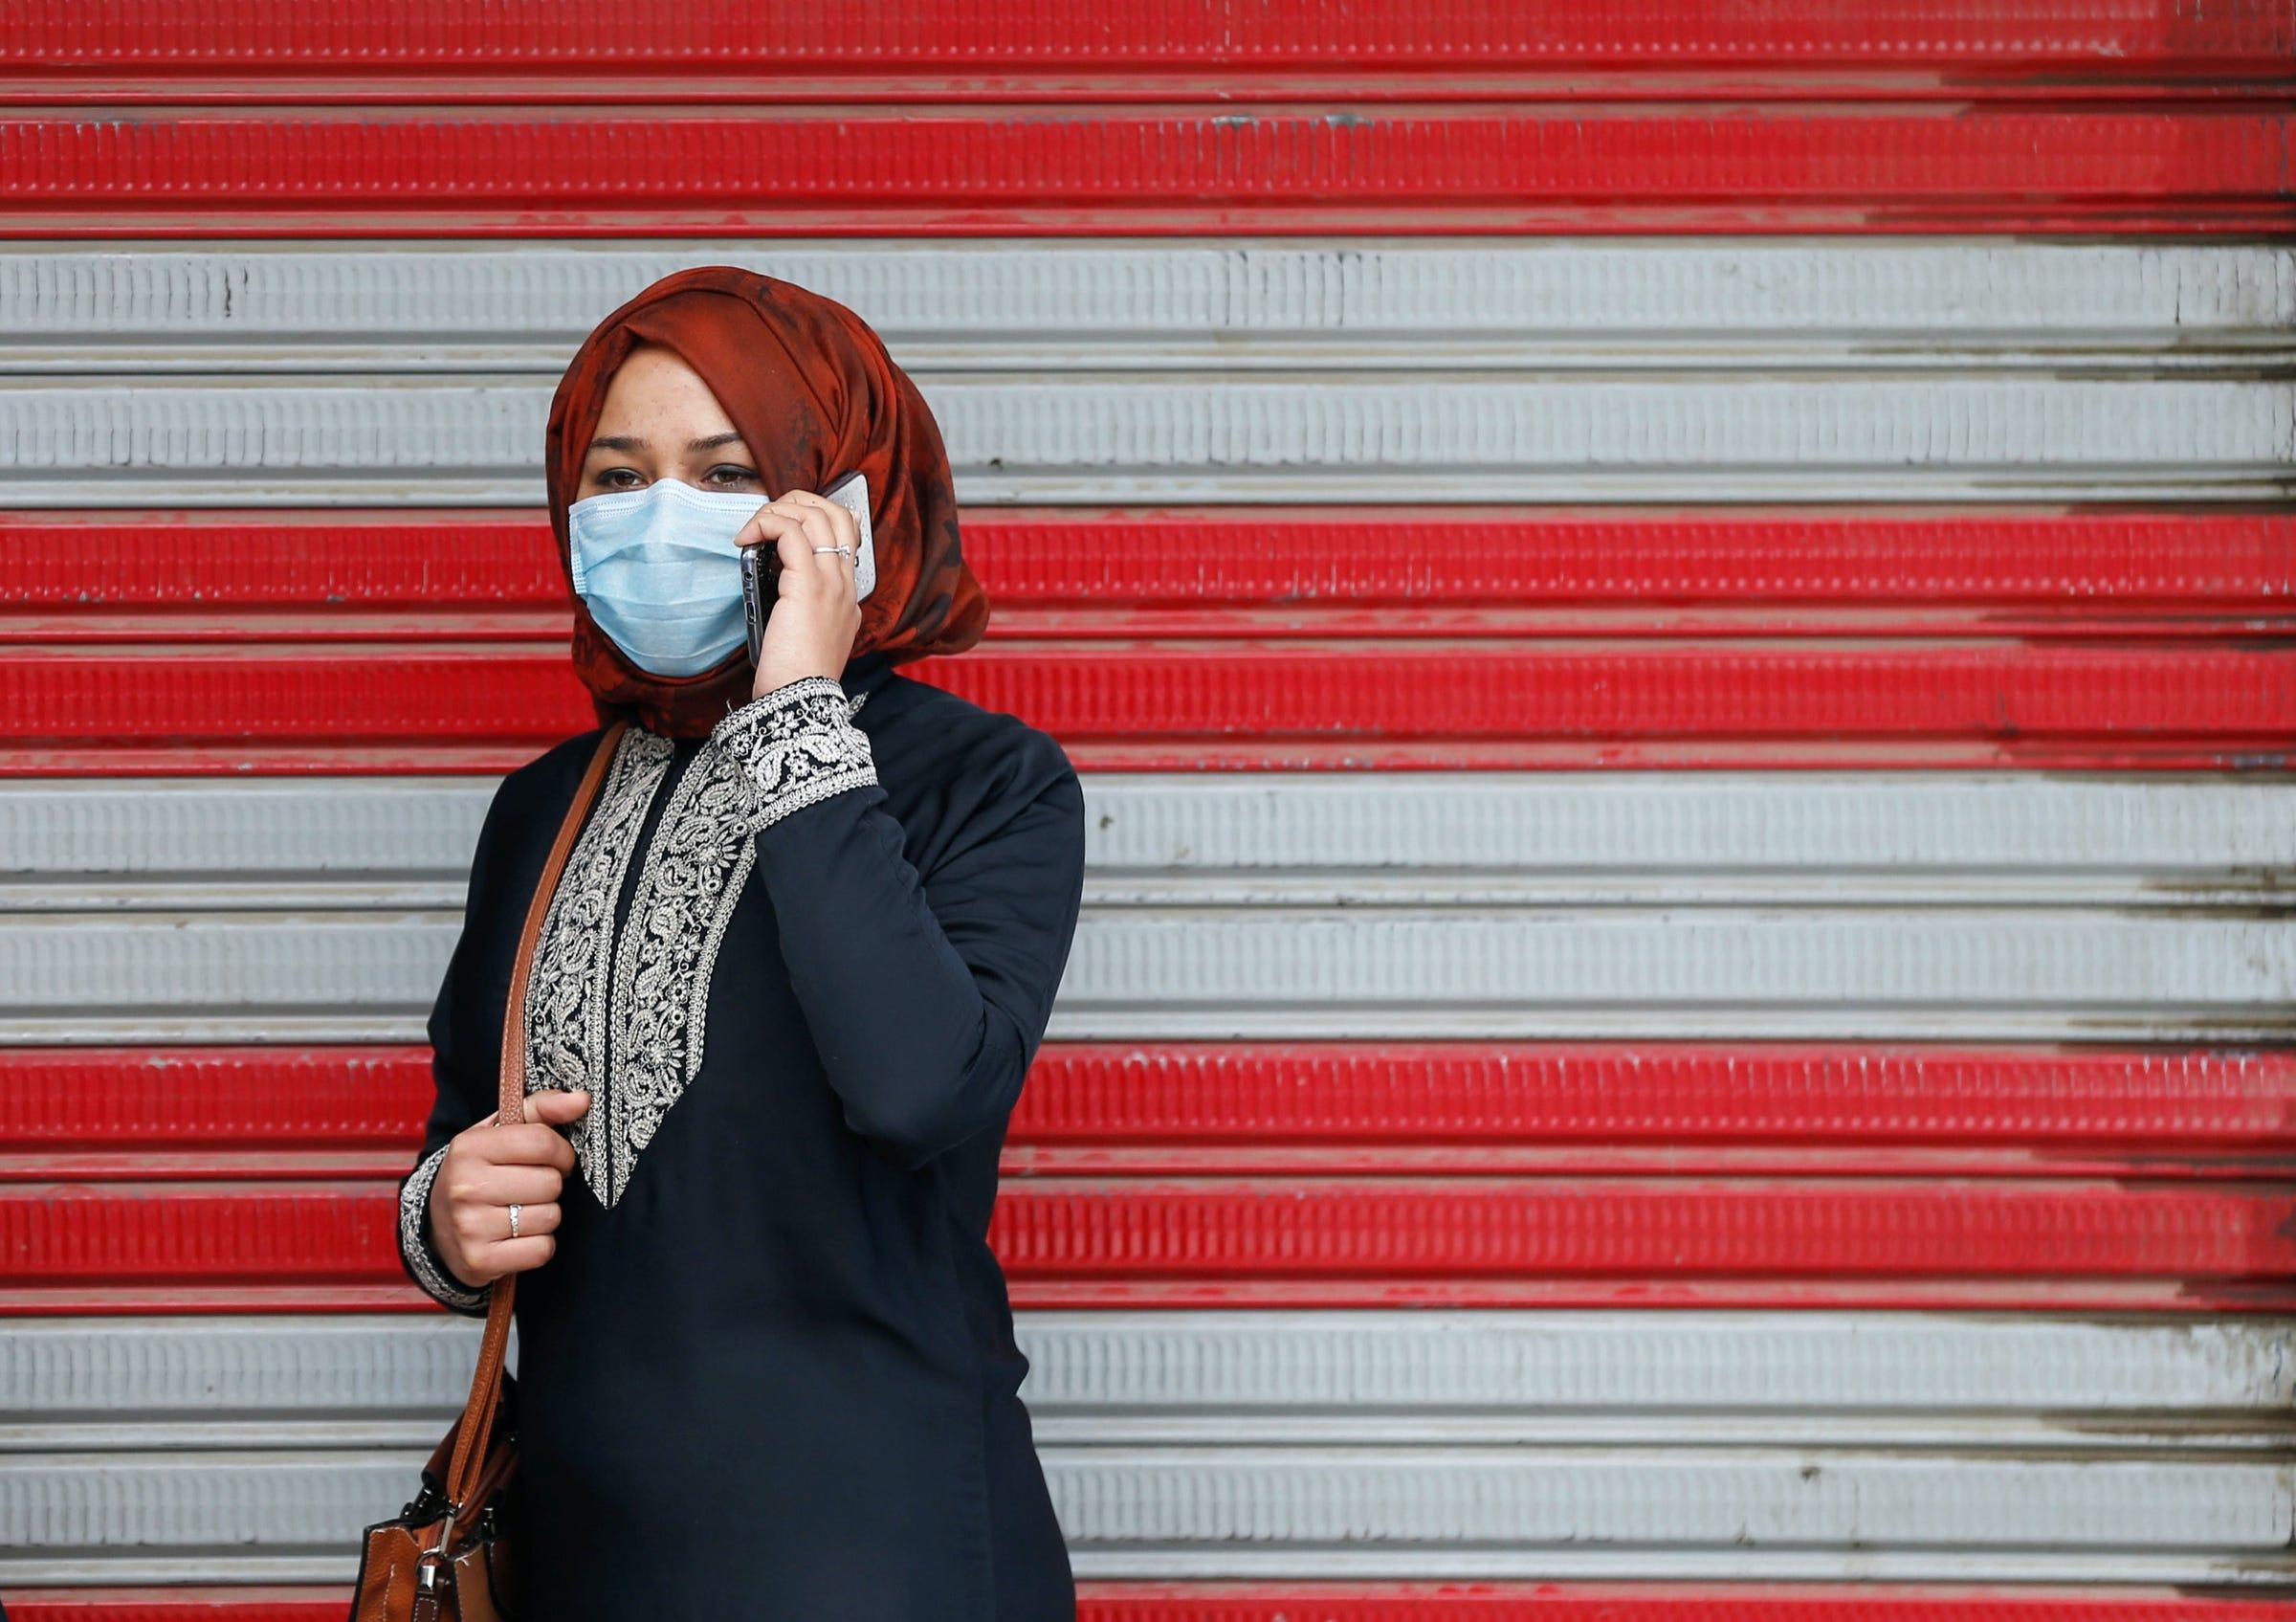 woman mobile cell phone coronavirus covid 19 surgical face mask kabul afghanistan red white background 2020 03 29T095012Z_1762391908_RC2LTF96UYPF_RTRMADP_3_HEALTH CORONAVIRUS AFGHANISTAN.JPG